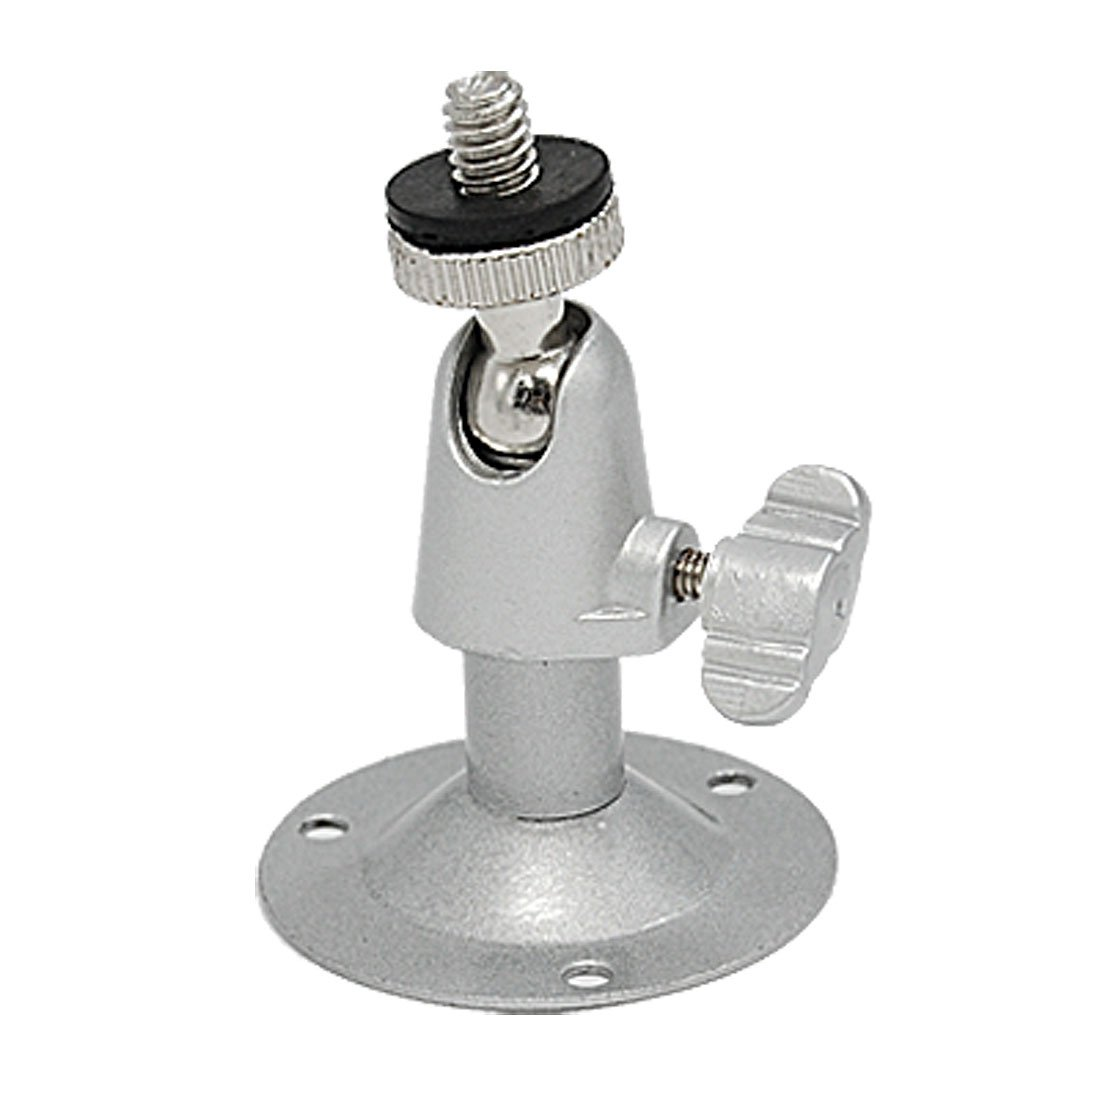 Sourcingmap –  Mini CCTV DVR Cá mara Soporte de pared soporte de techo Soporte a09101300ux0120